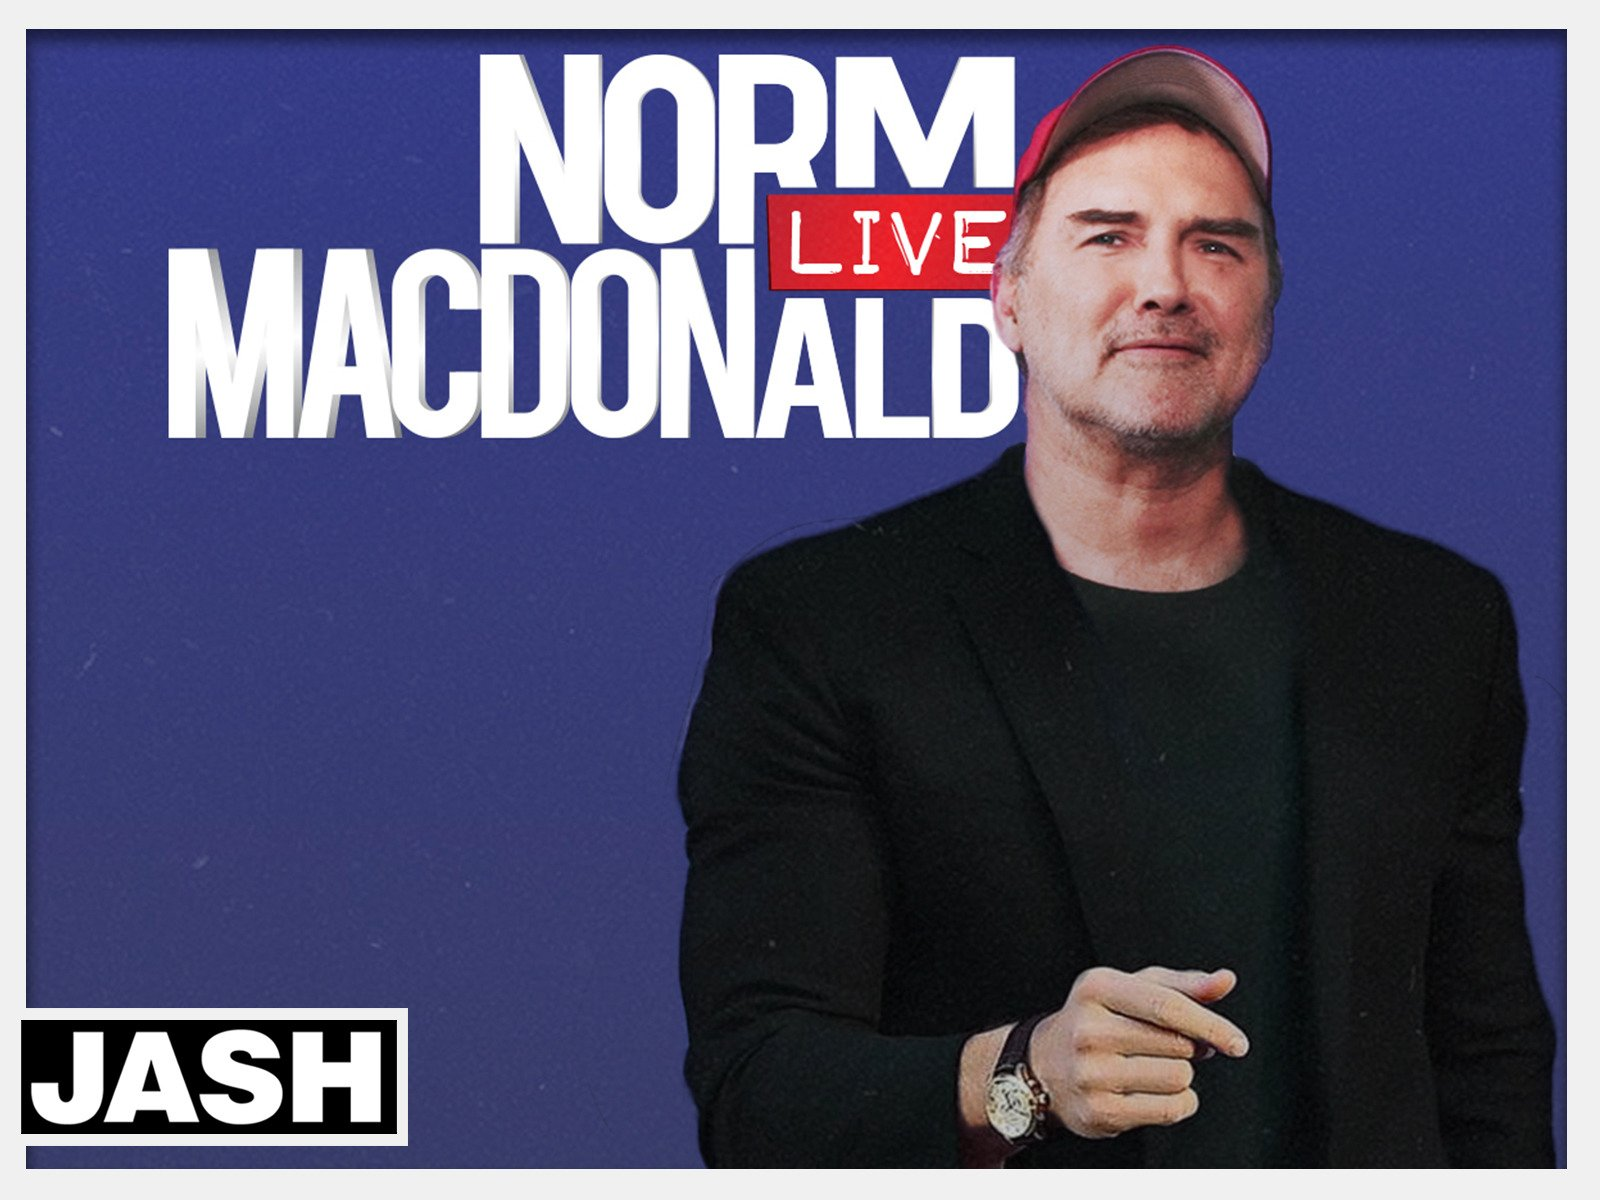 Norm Macdonald Live - Season 3